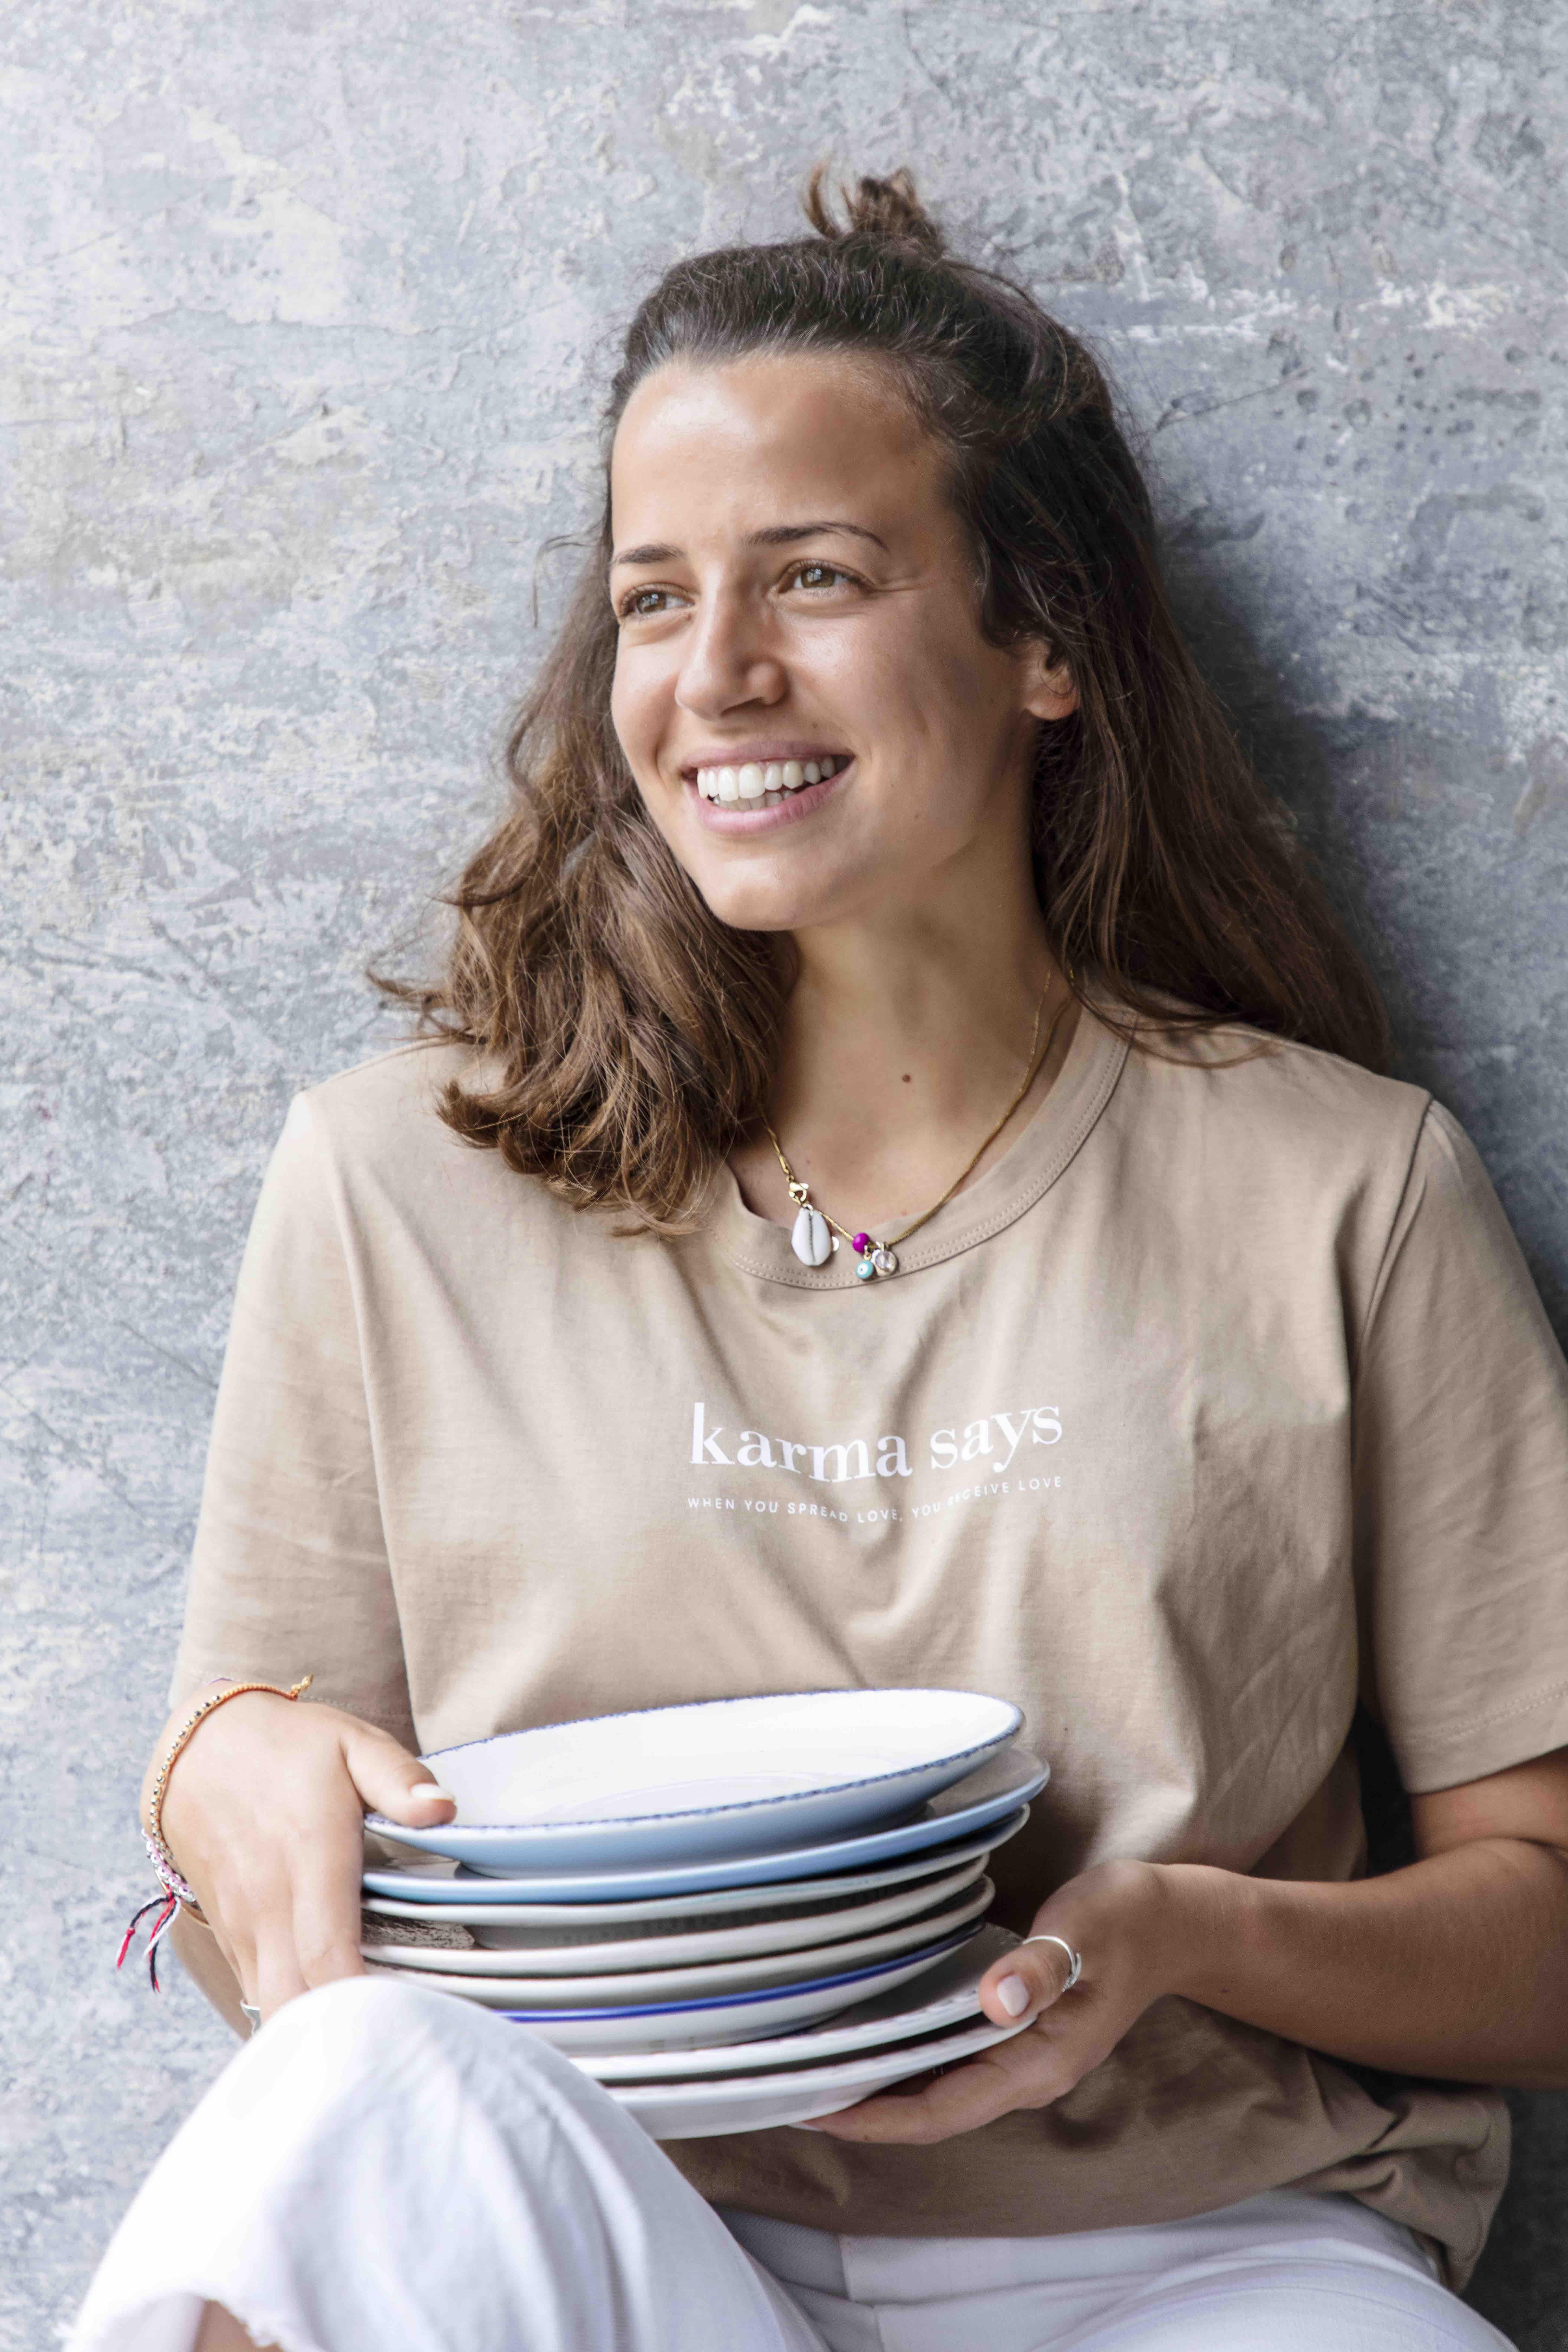 stress free cooking playlist | please consider | joana limao